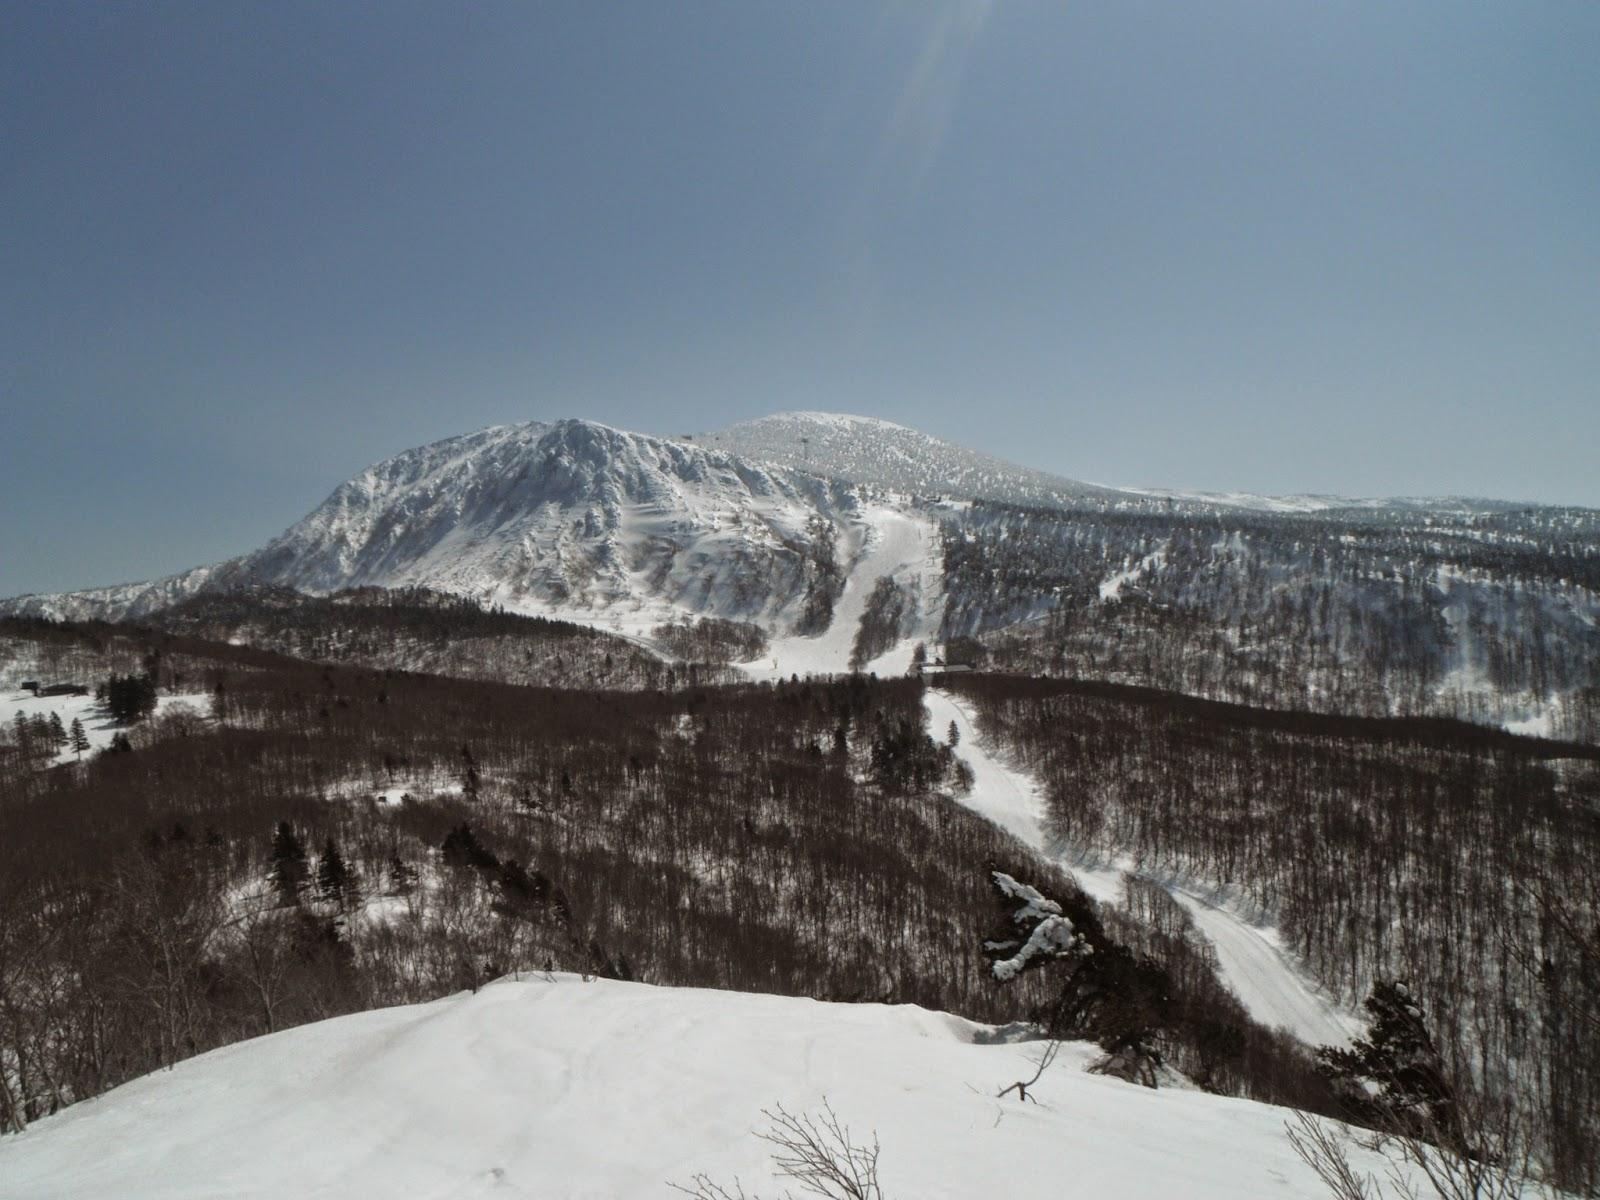 温泉 スキー 場 天気 蔵王